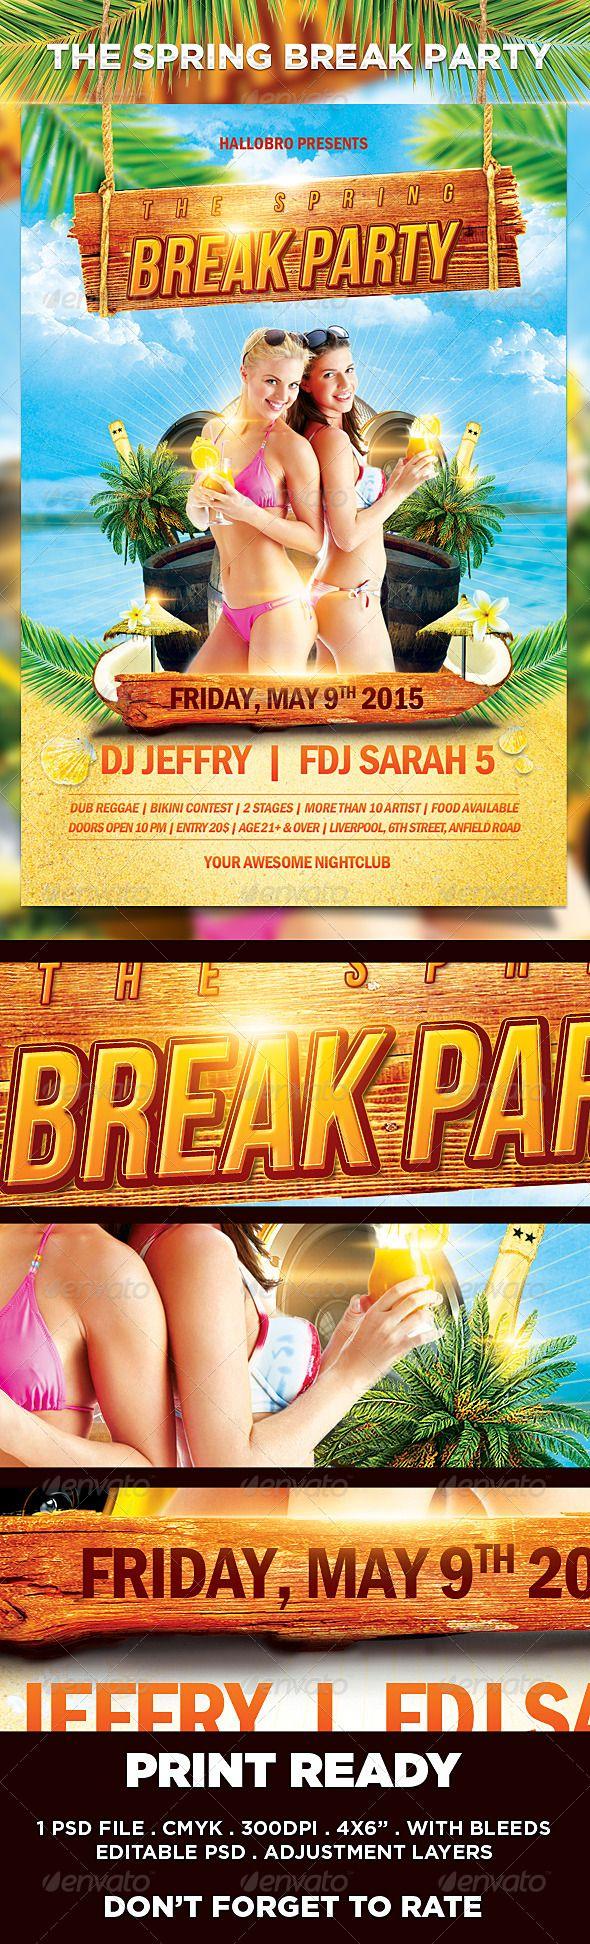 The Break Party Flyer